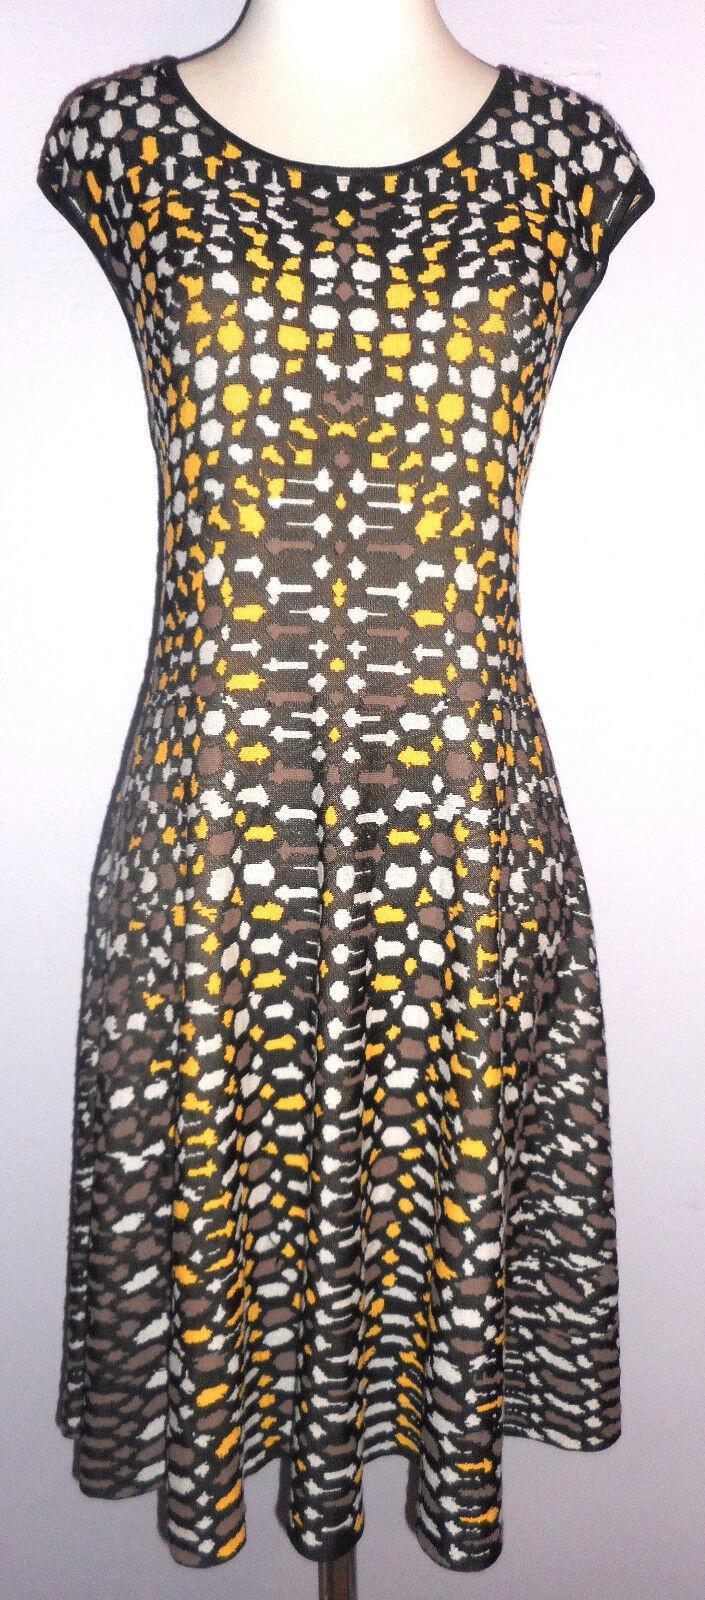 New Nic + Zoe Melody Twirl Dress, size L